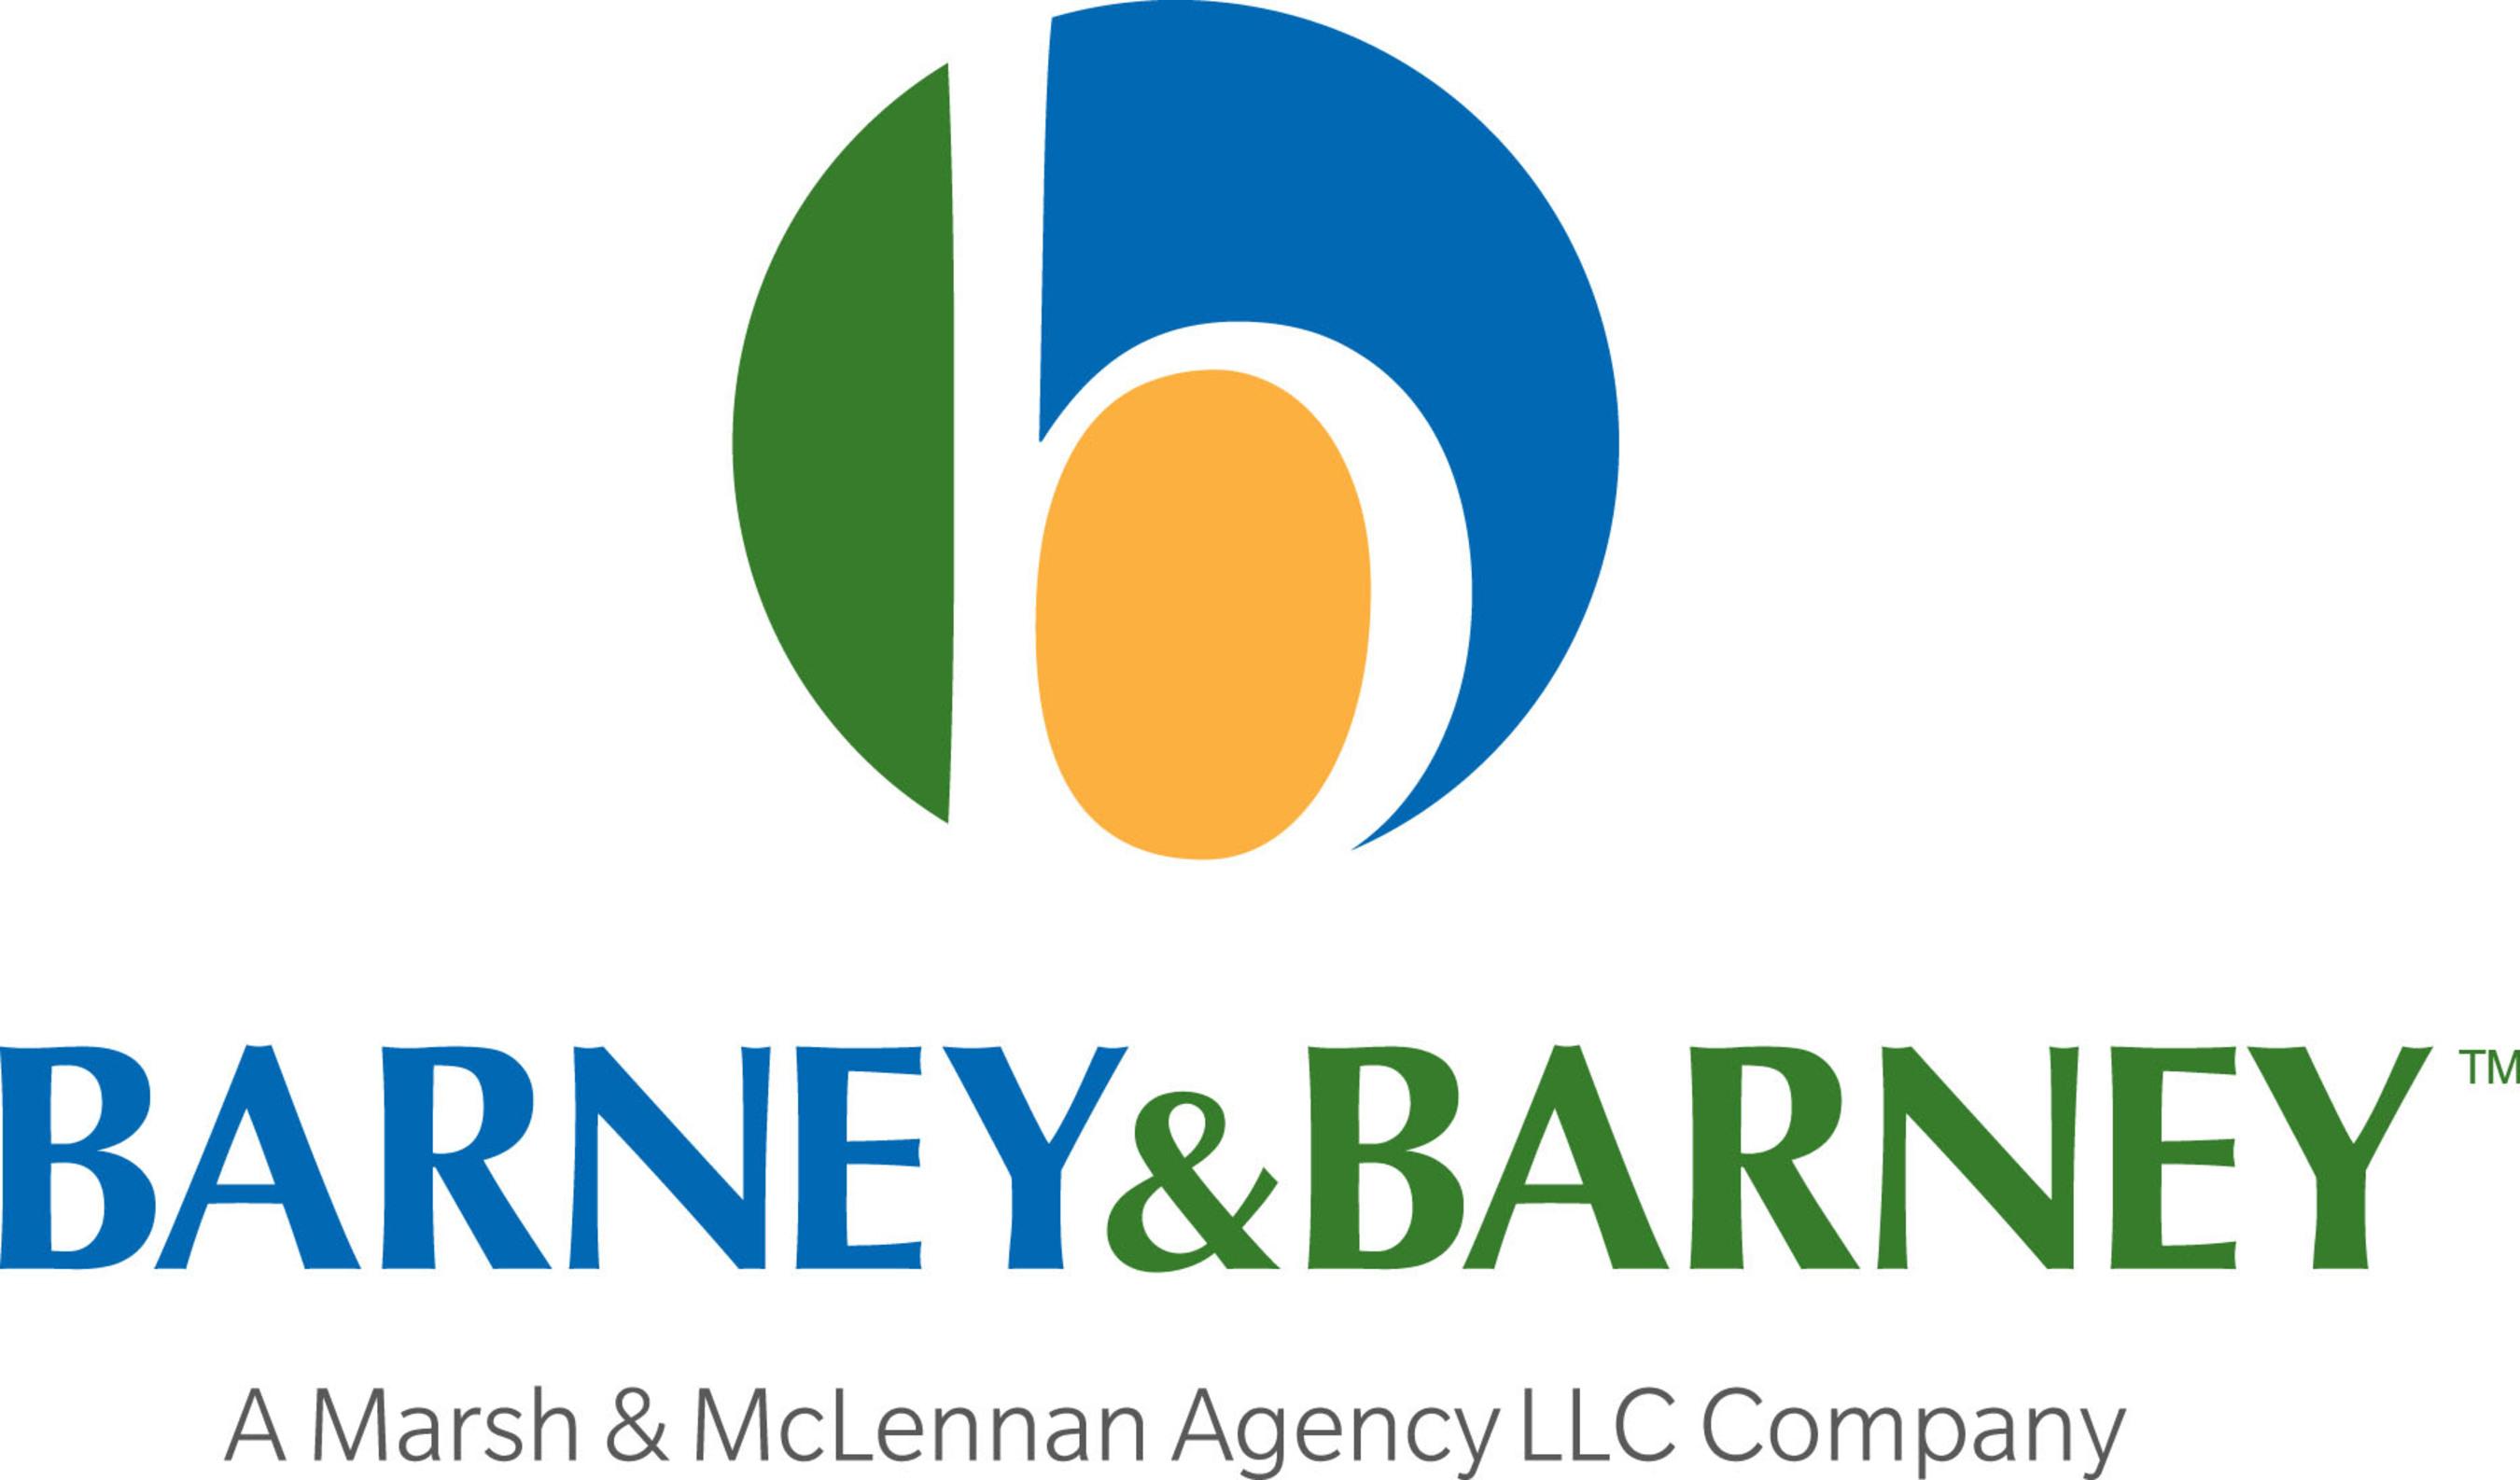 Barney & Barney, LLC logo.